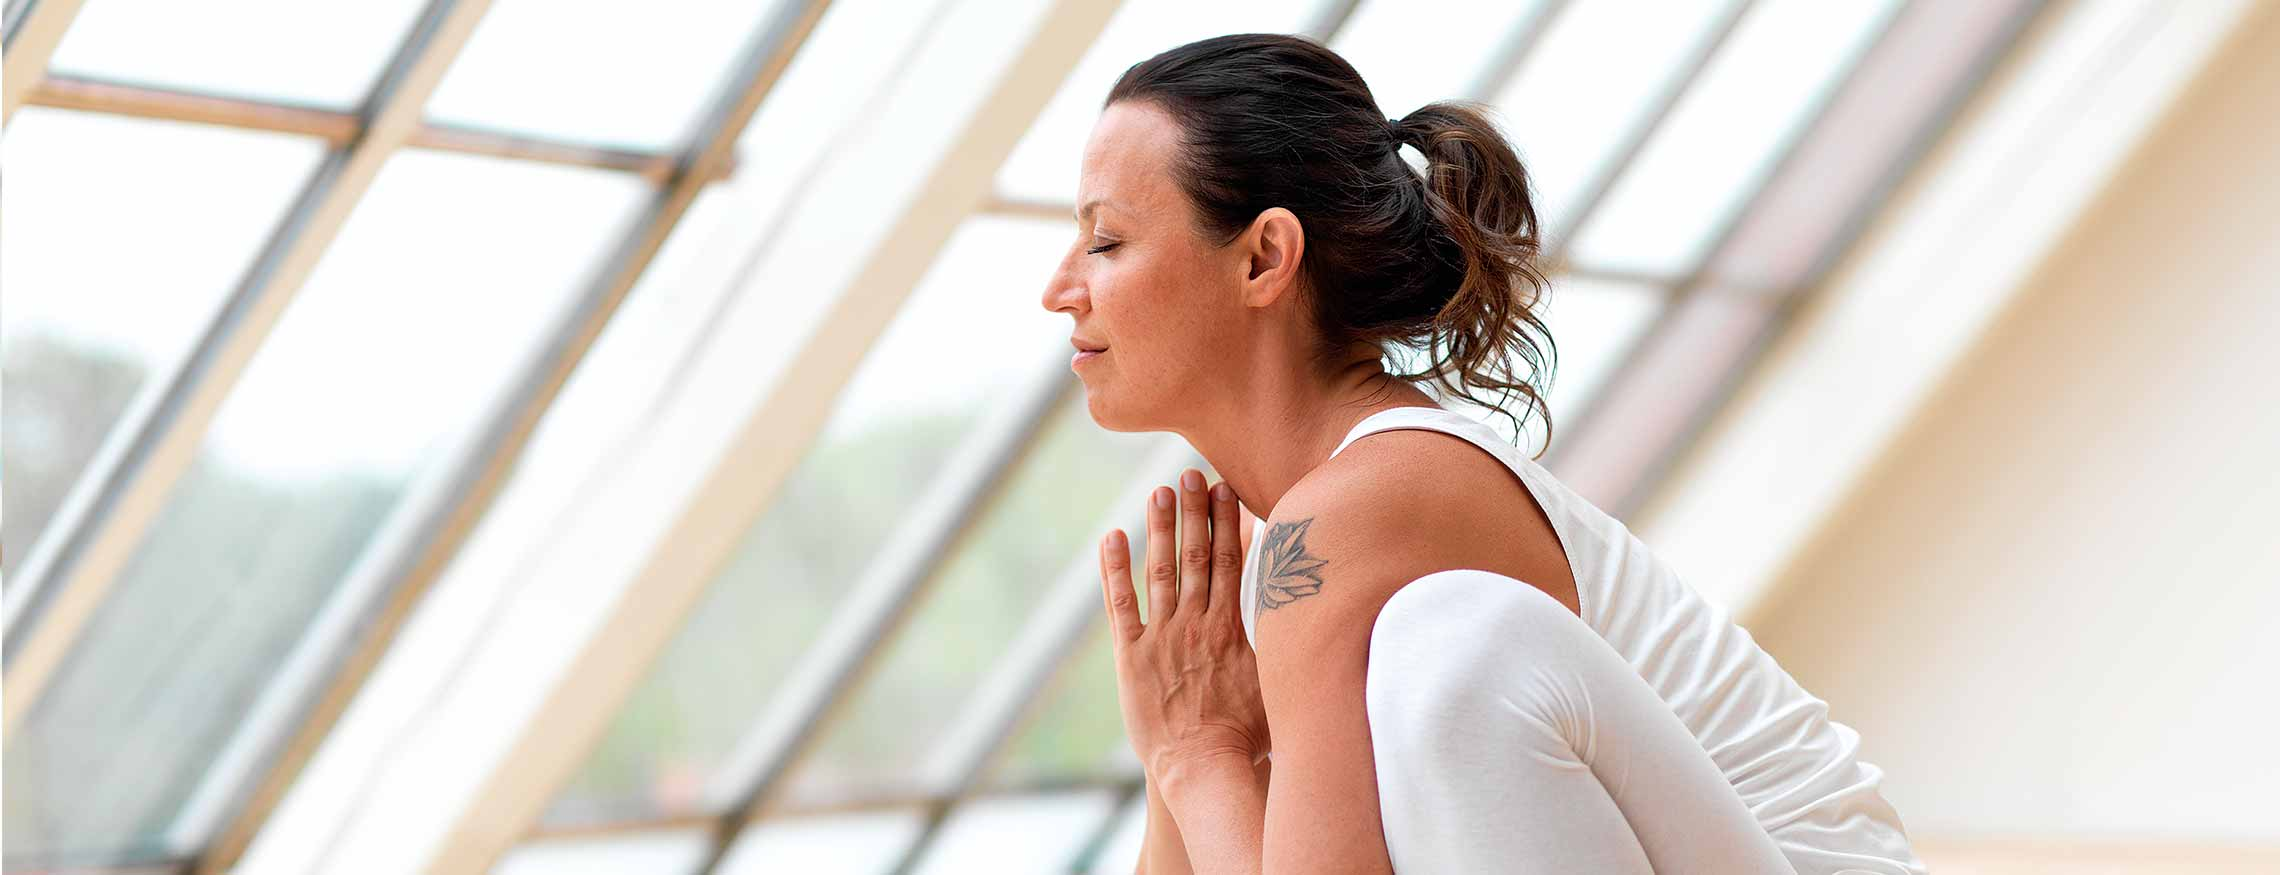 Magdalena Mecweld - Yin yoga - Huksittande